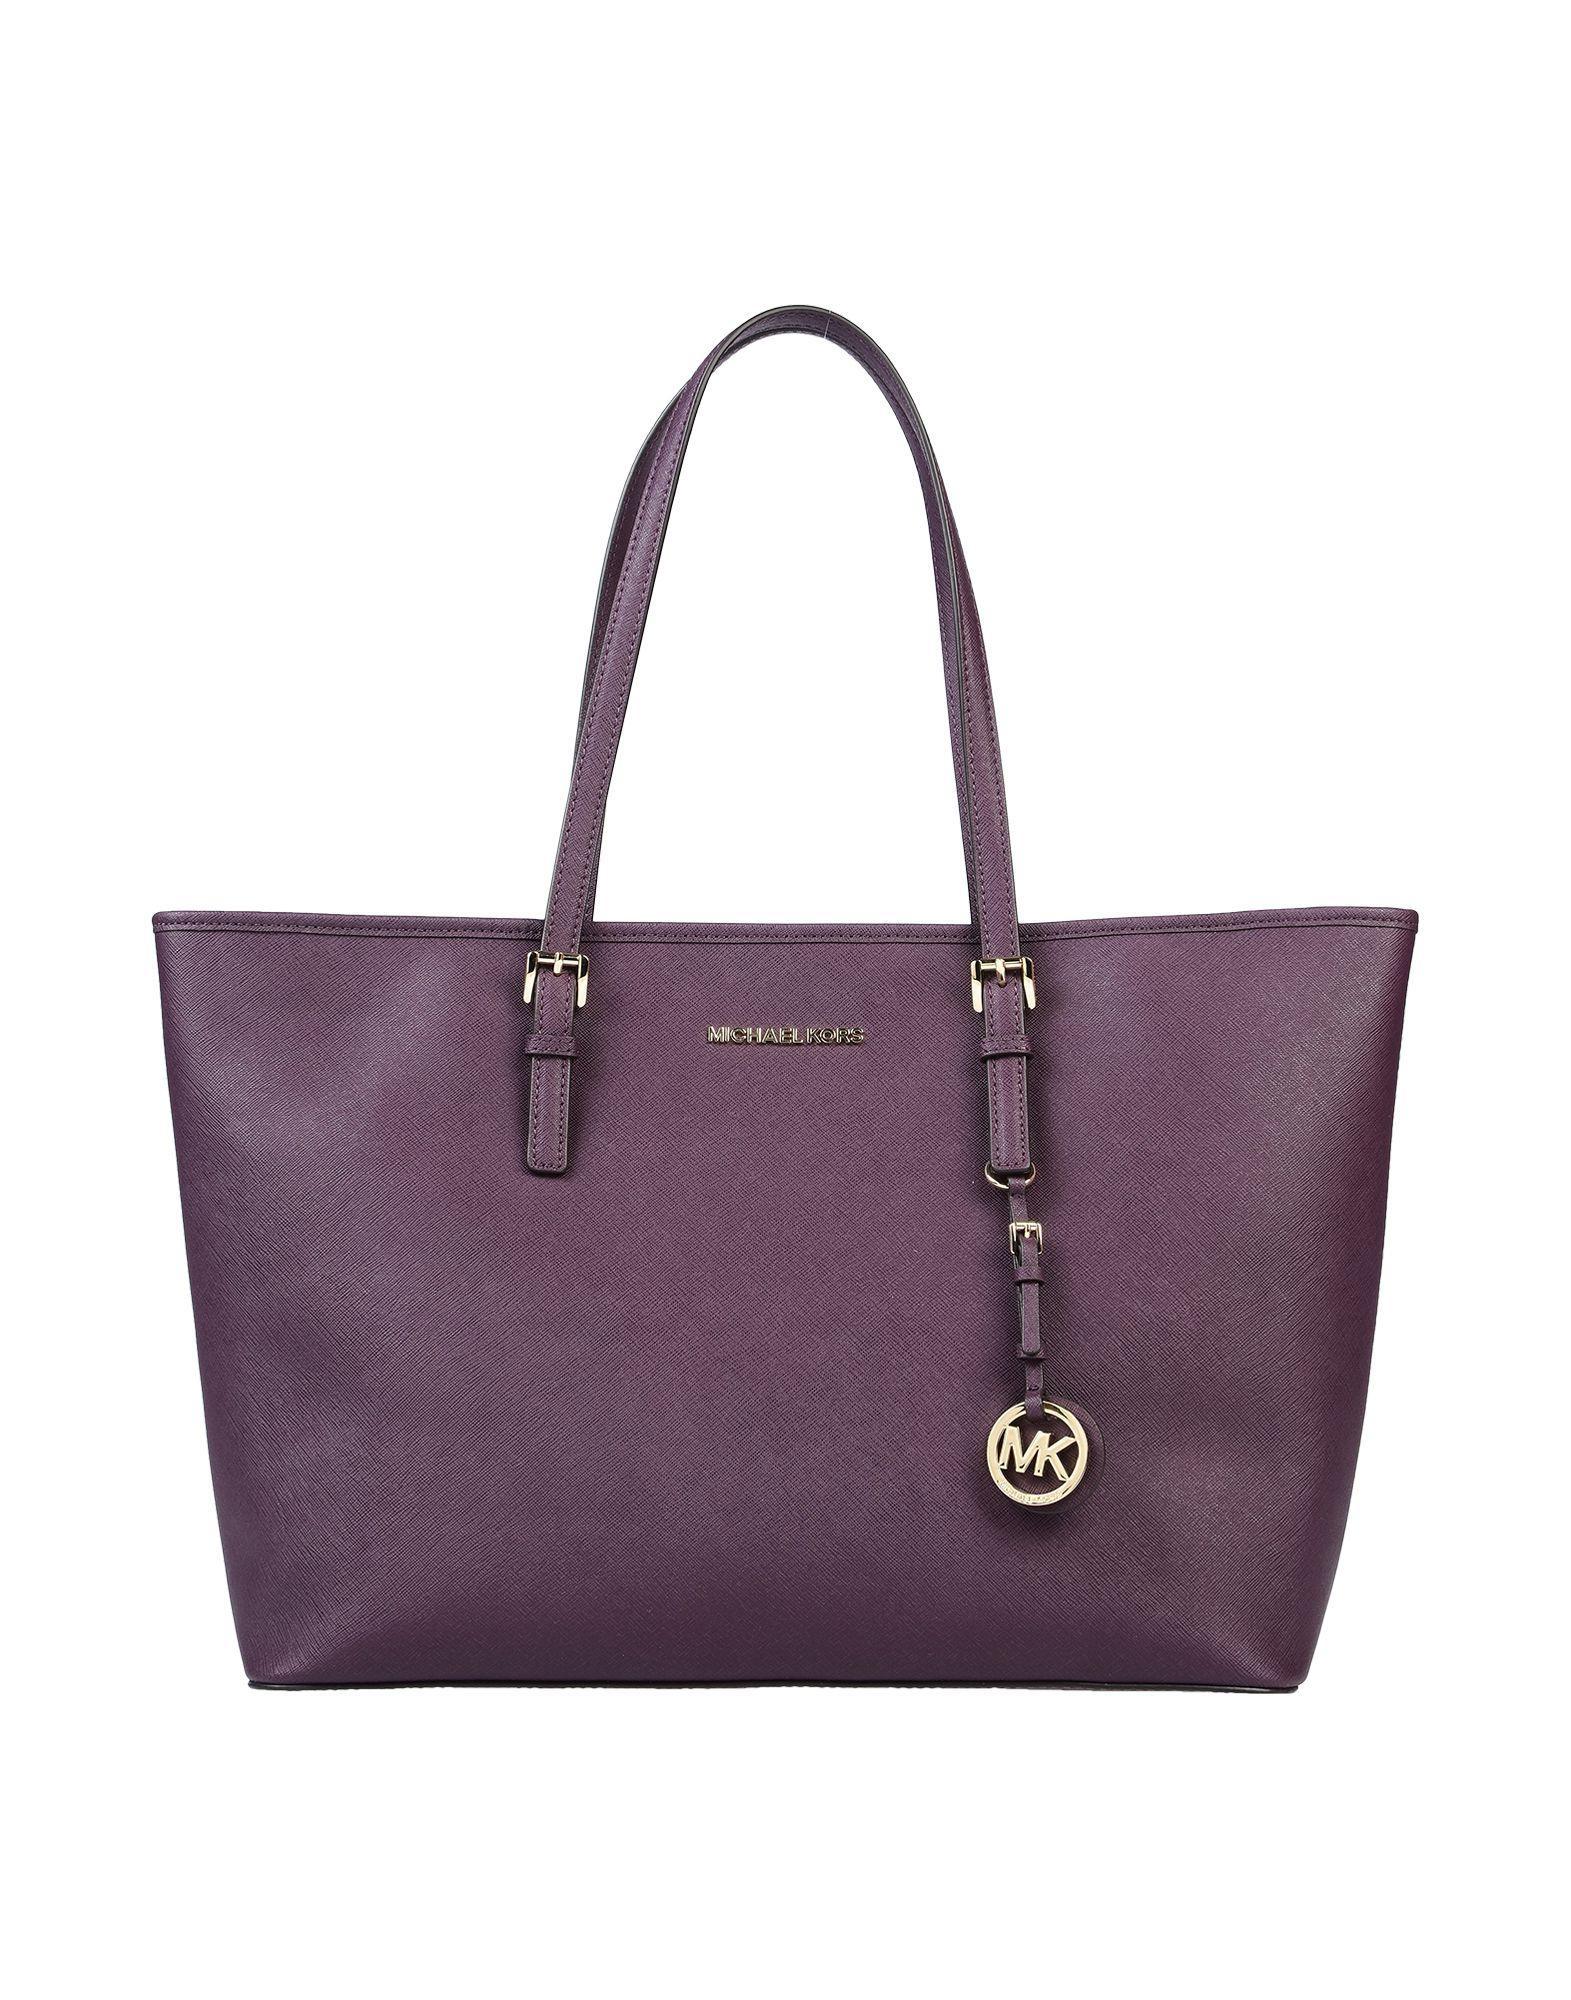 Michael Kors Leather Handbag In